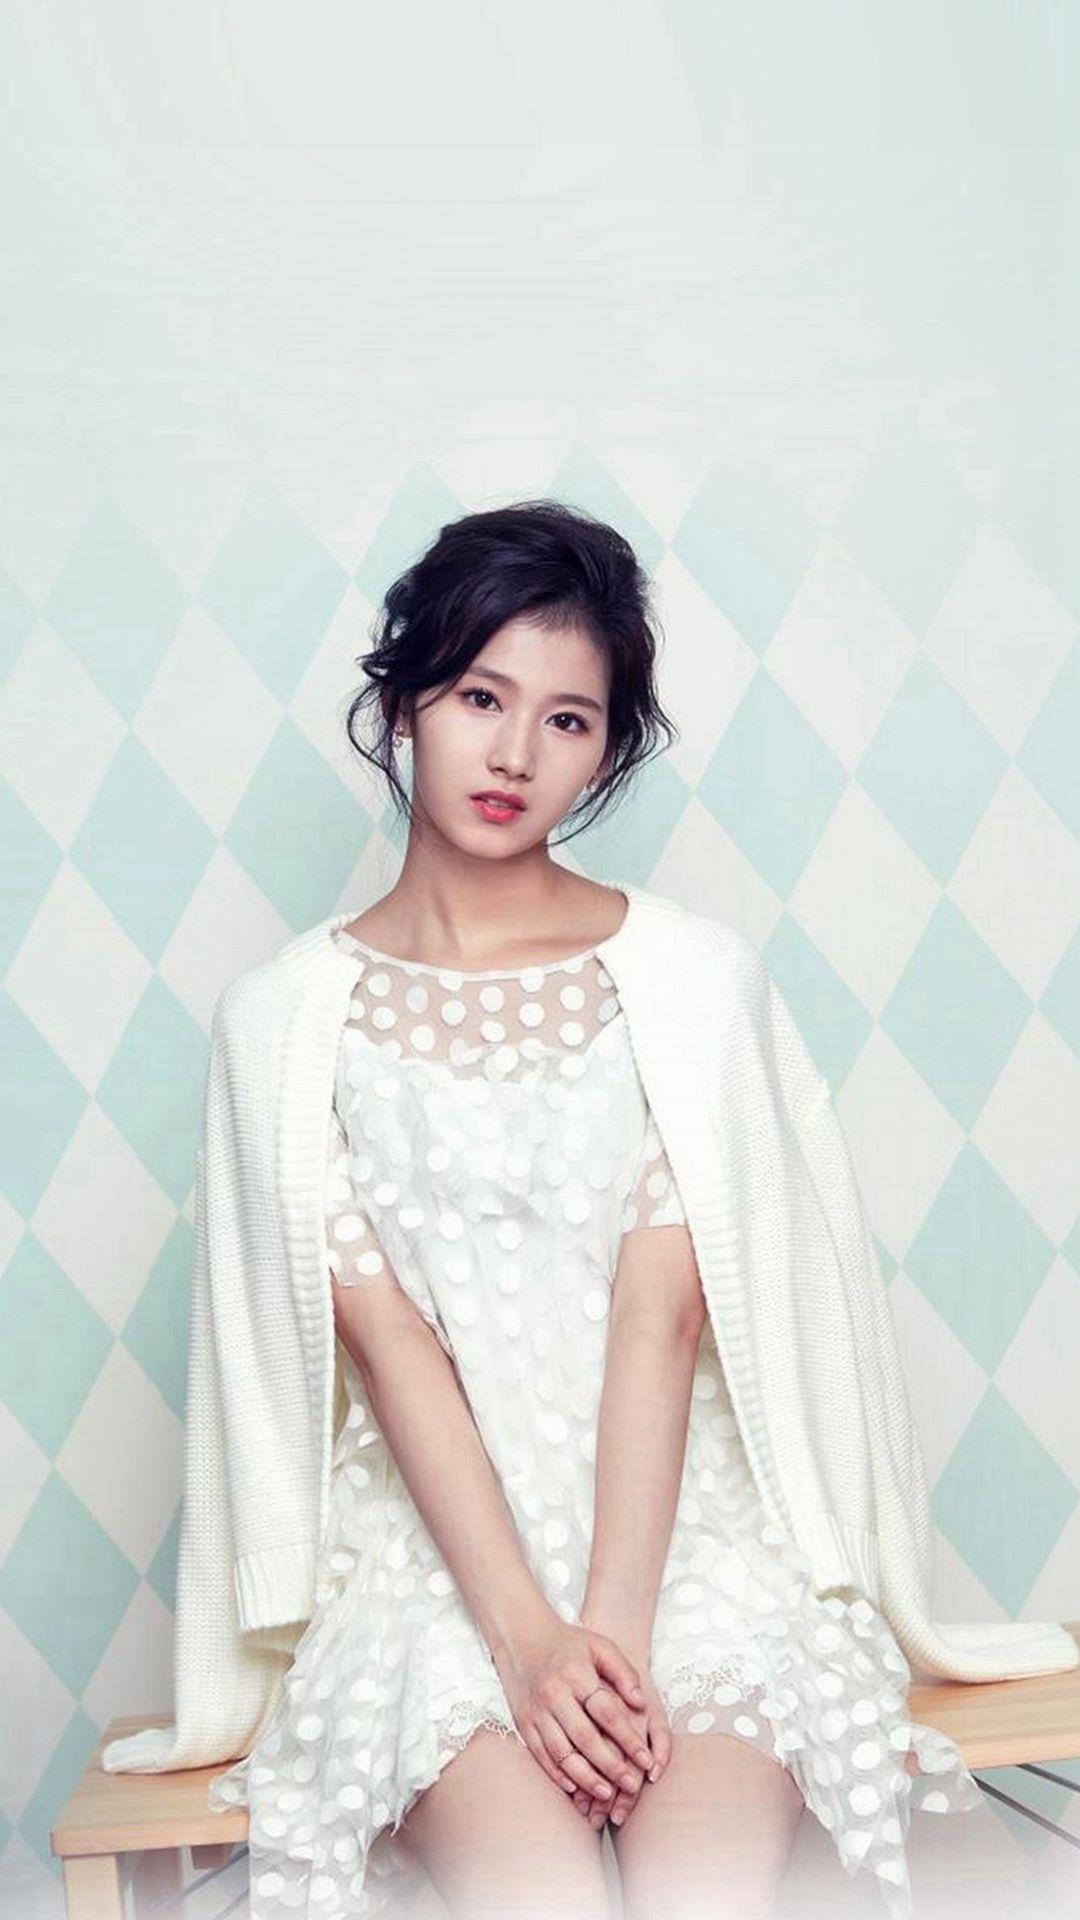 Sana Girl Kpop Twice iPhone 6 wallpaper Kpop girls